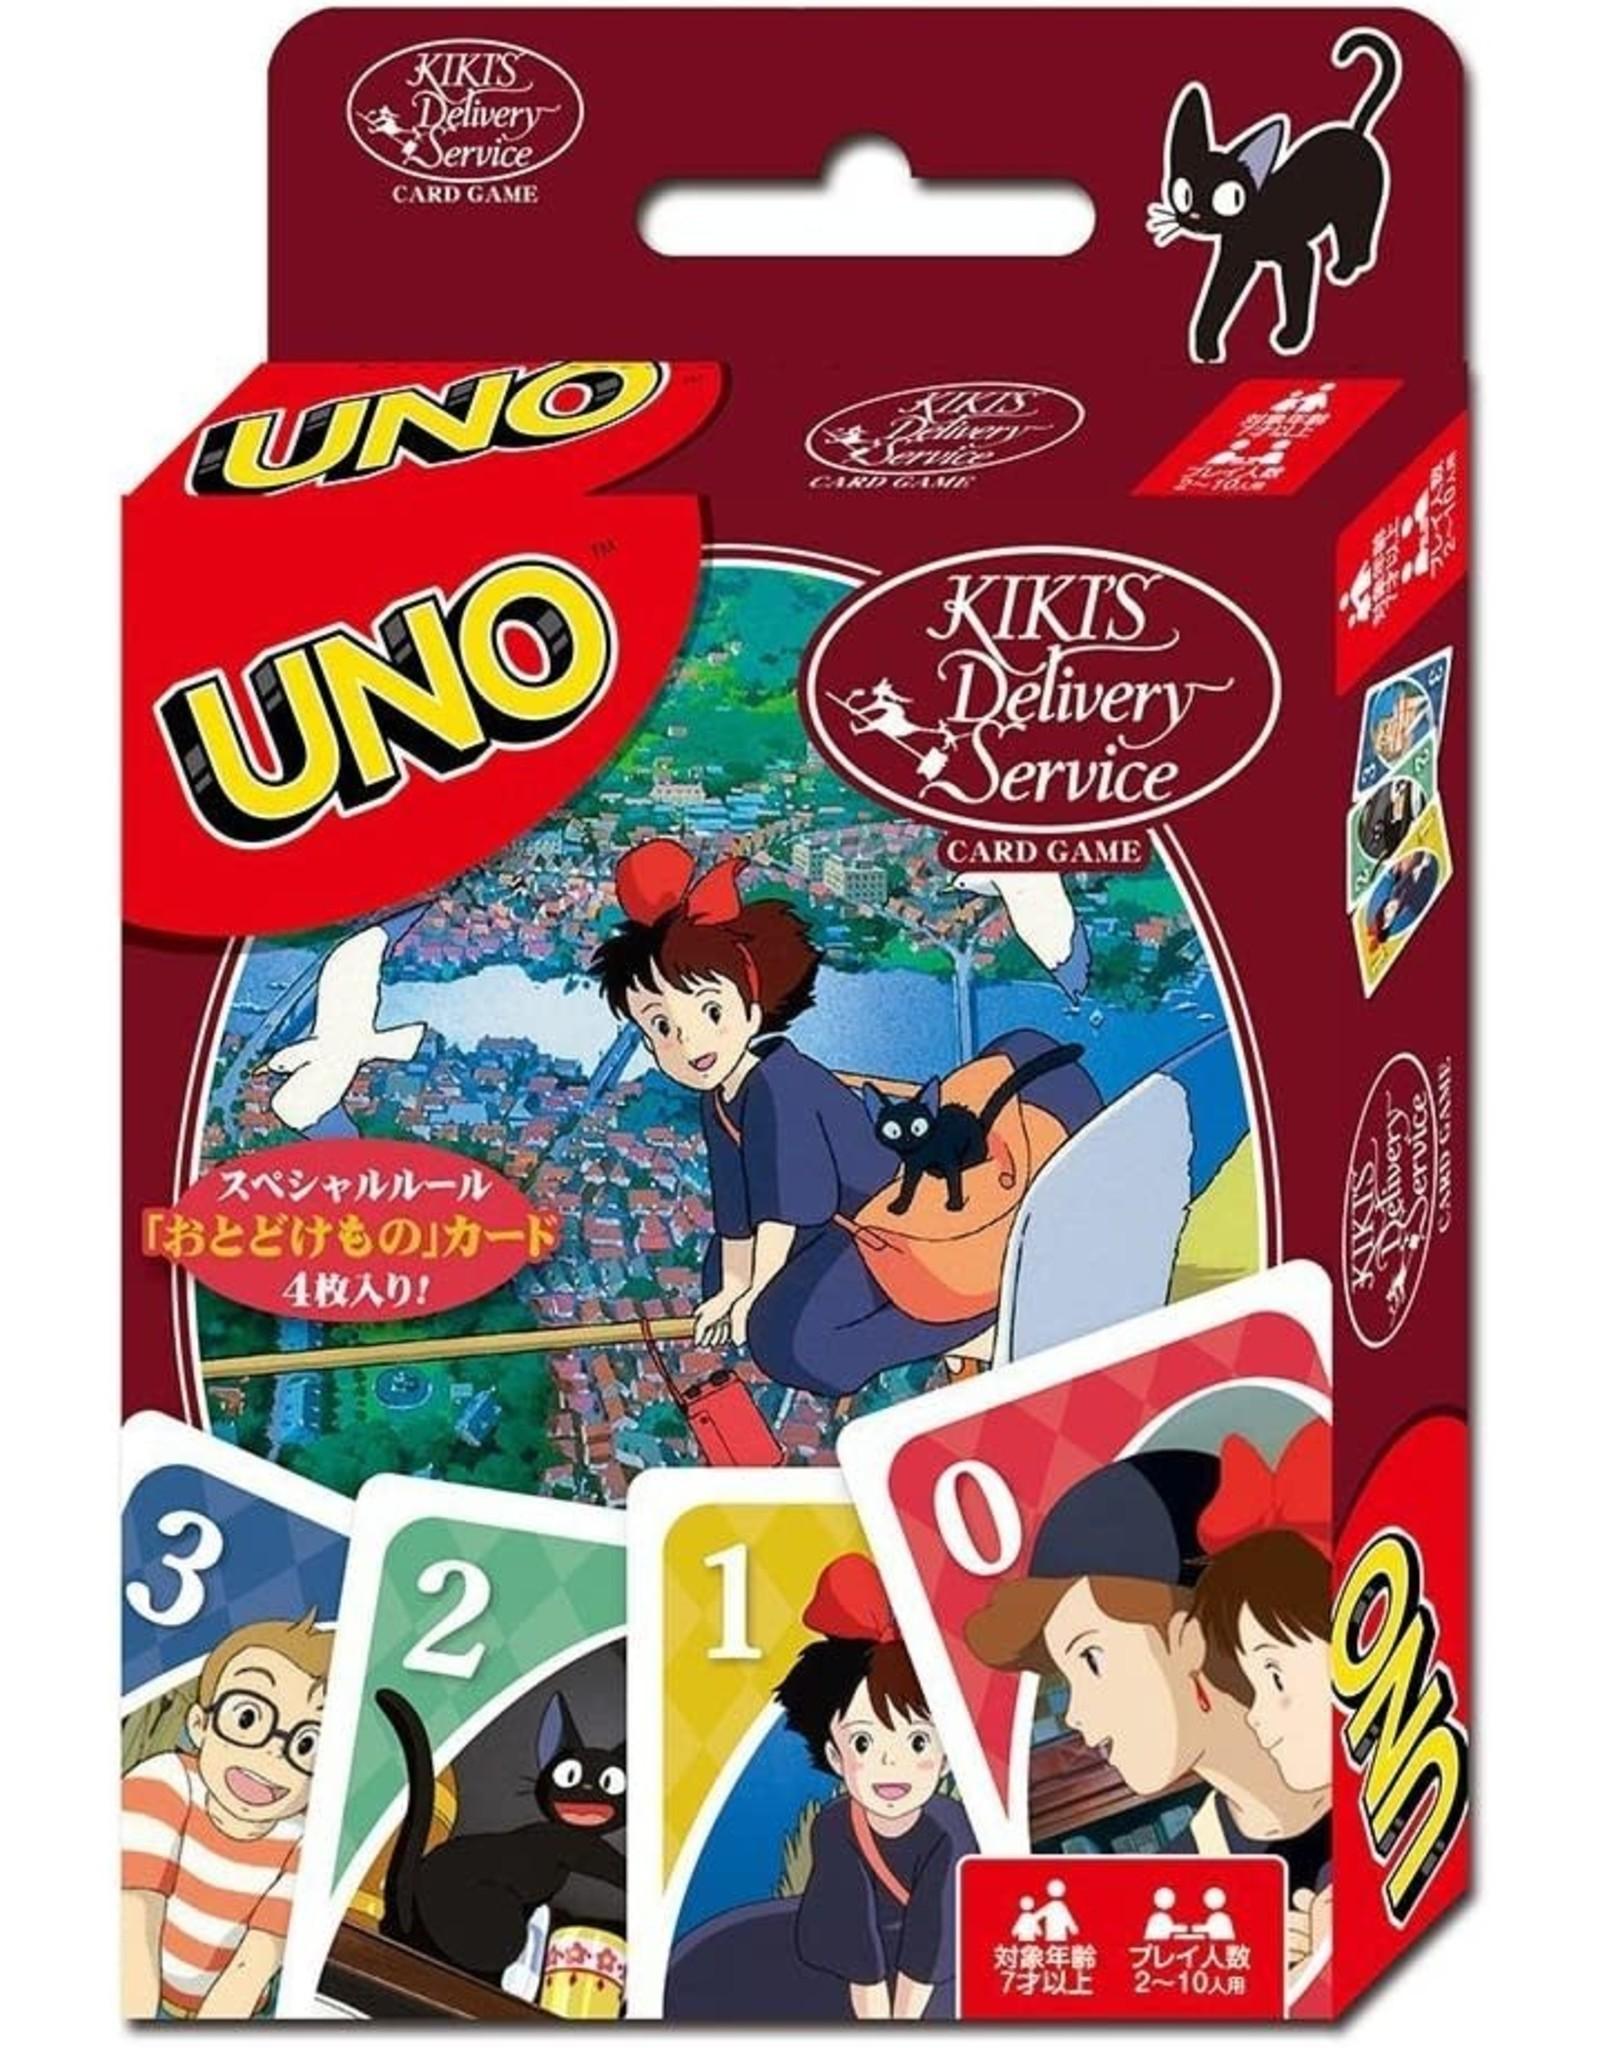 UNO - Studio Ghibli: Kiki's Delivery Service - Japanese import